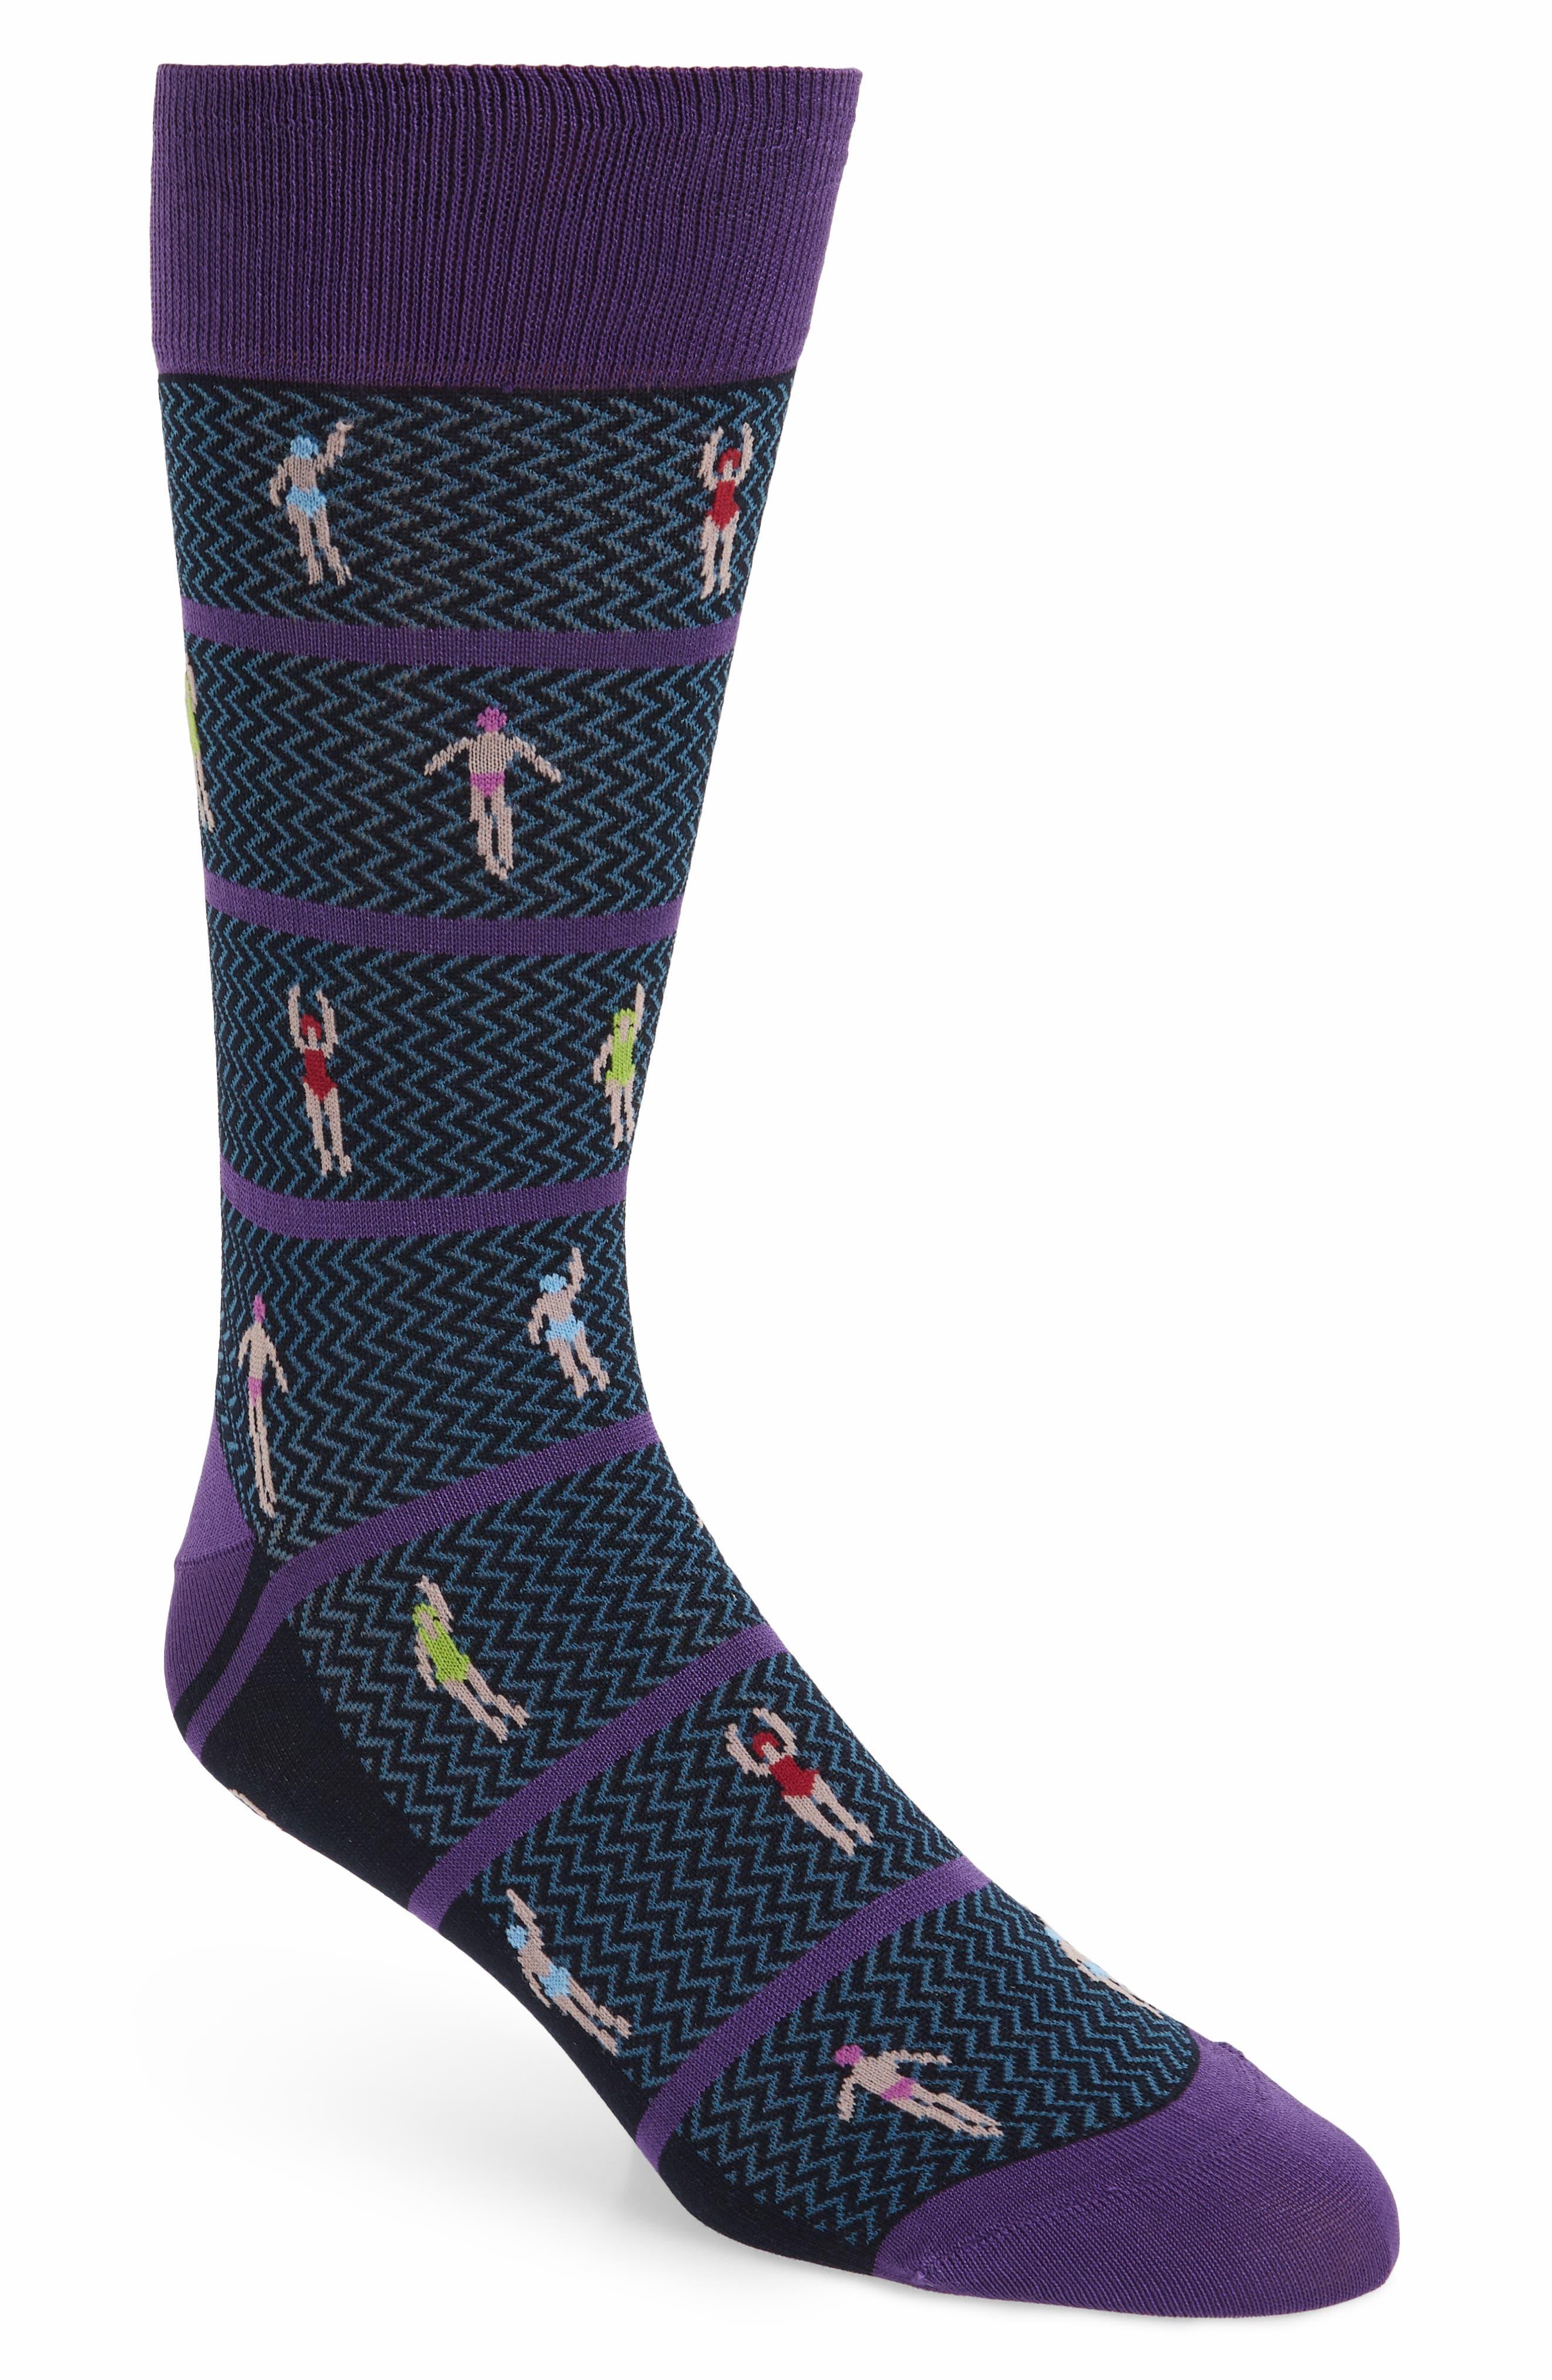 Cotton Blend Socks,                             Main thumbnail 1, color,                             Grape